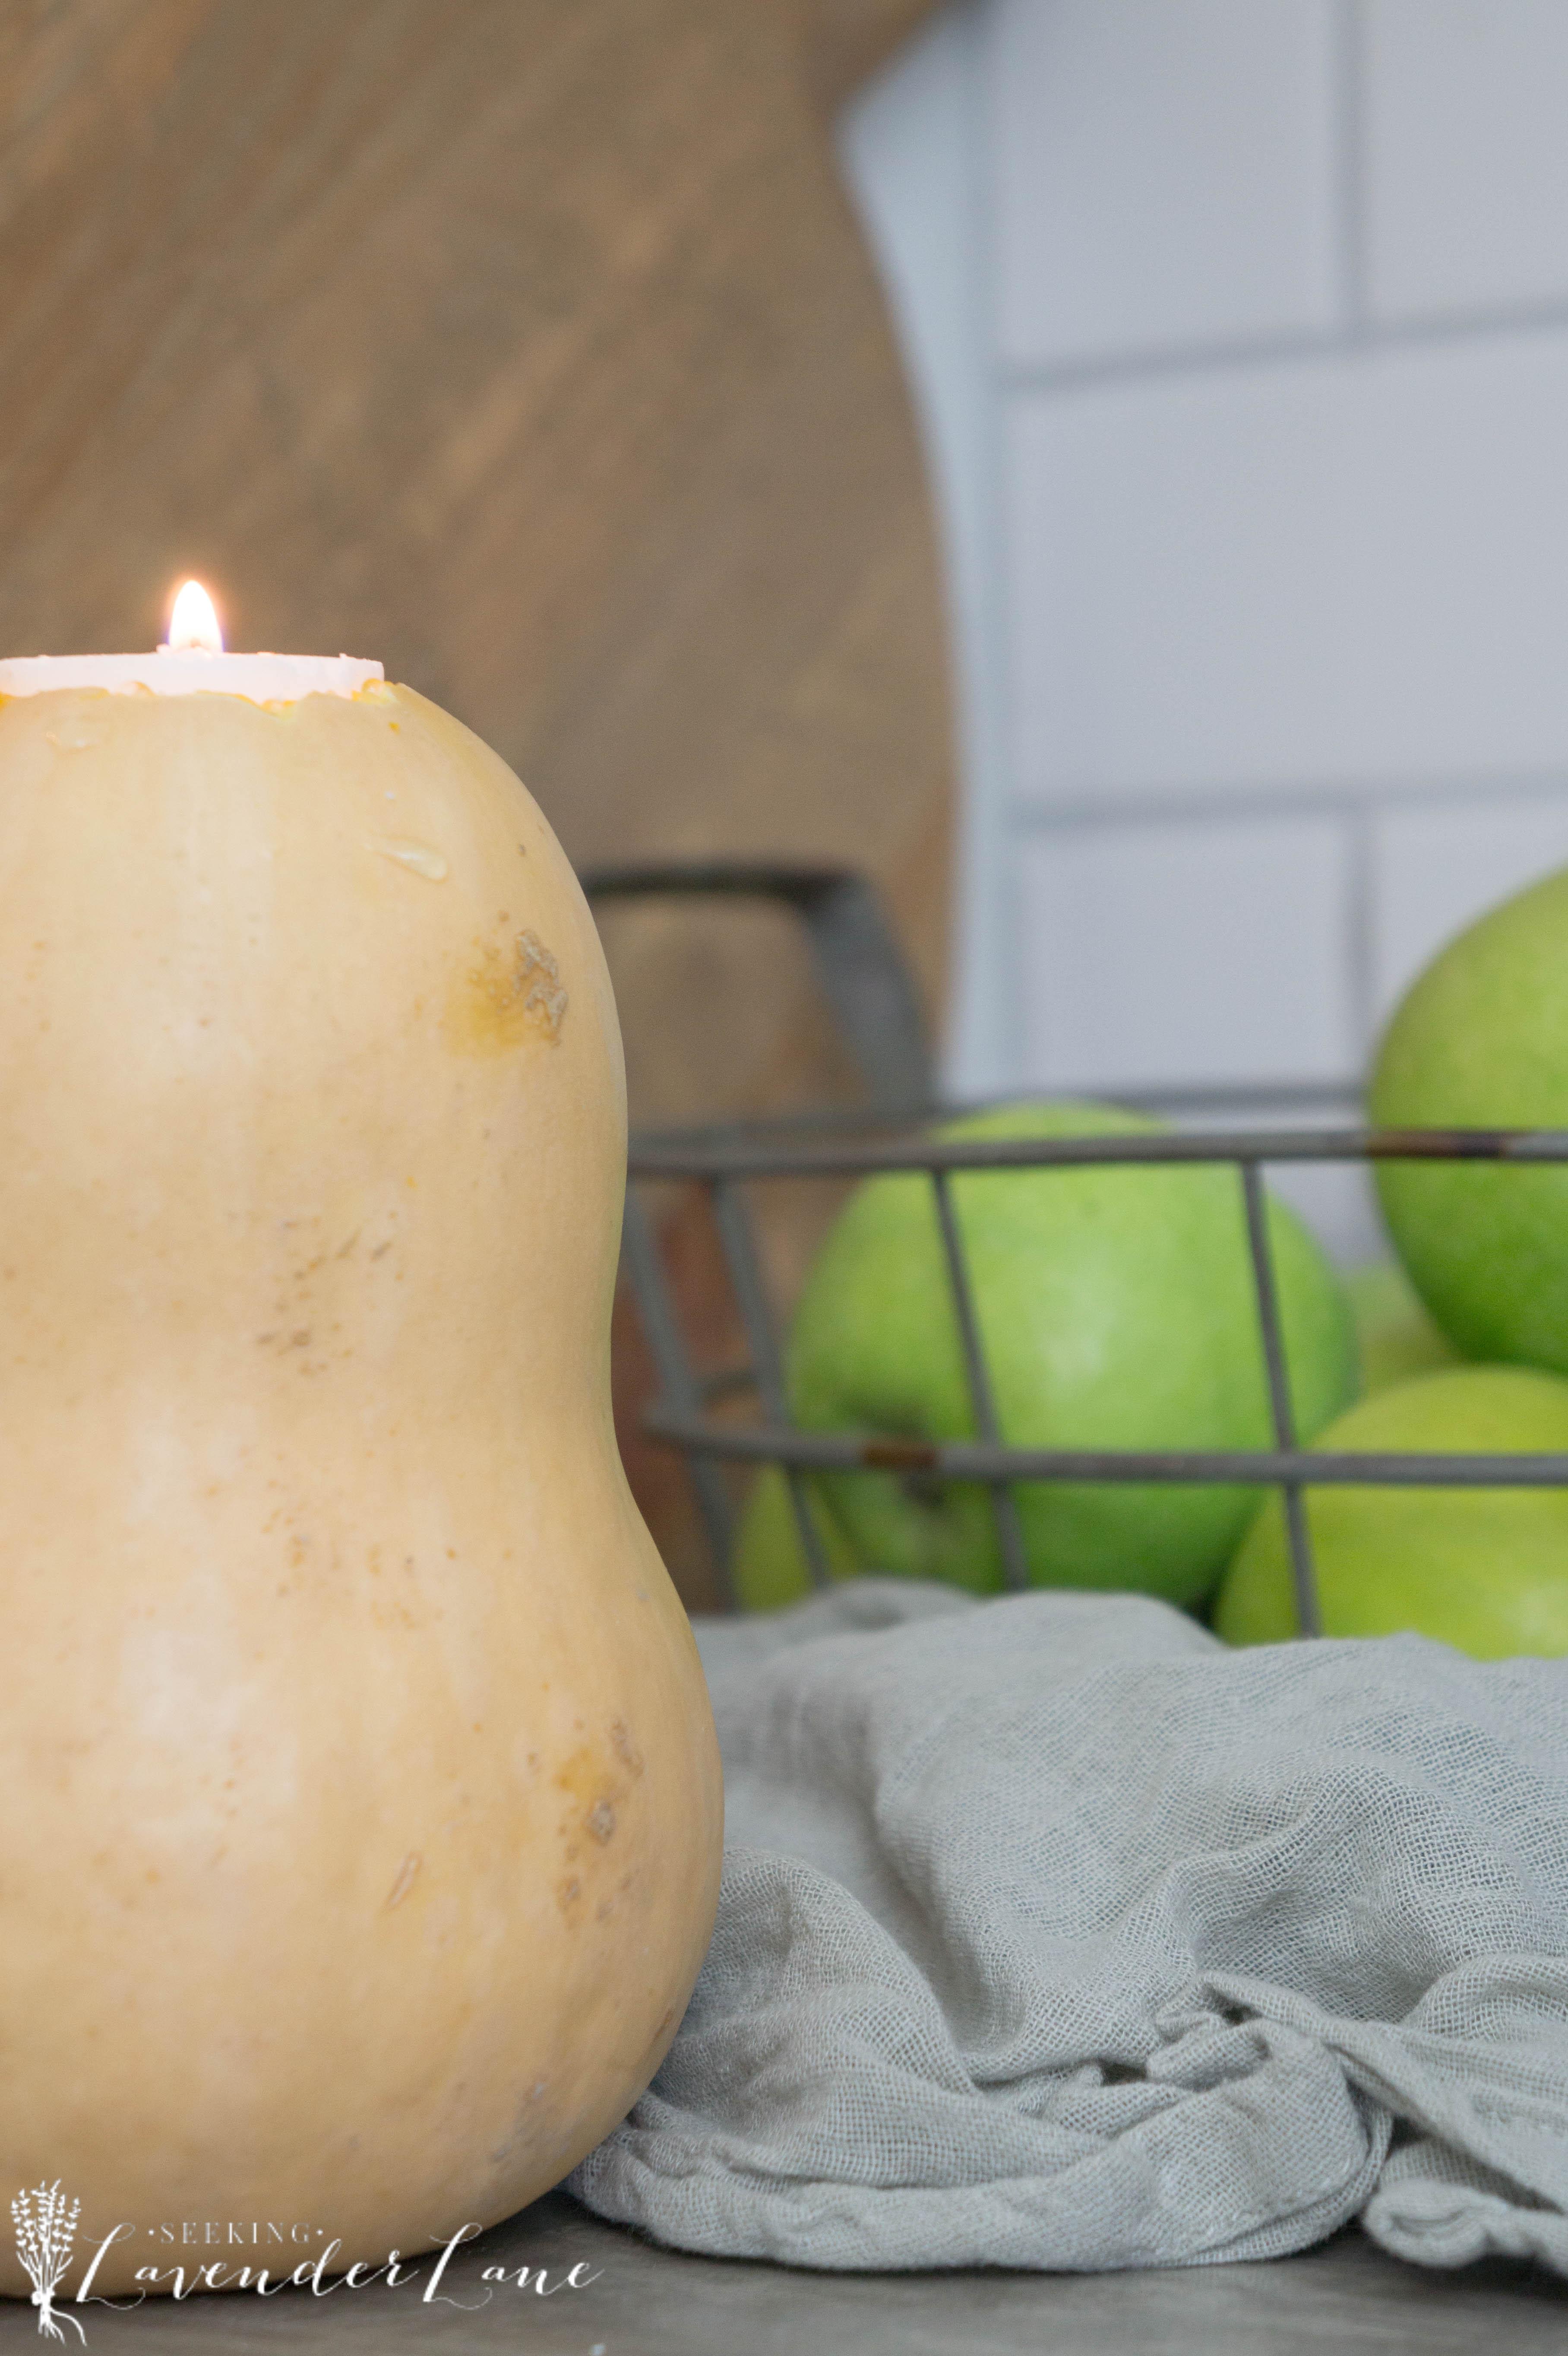 diy-squash-fall-candle-9